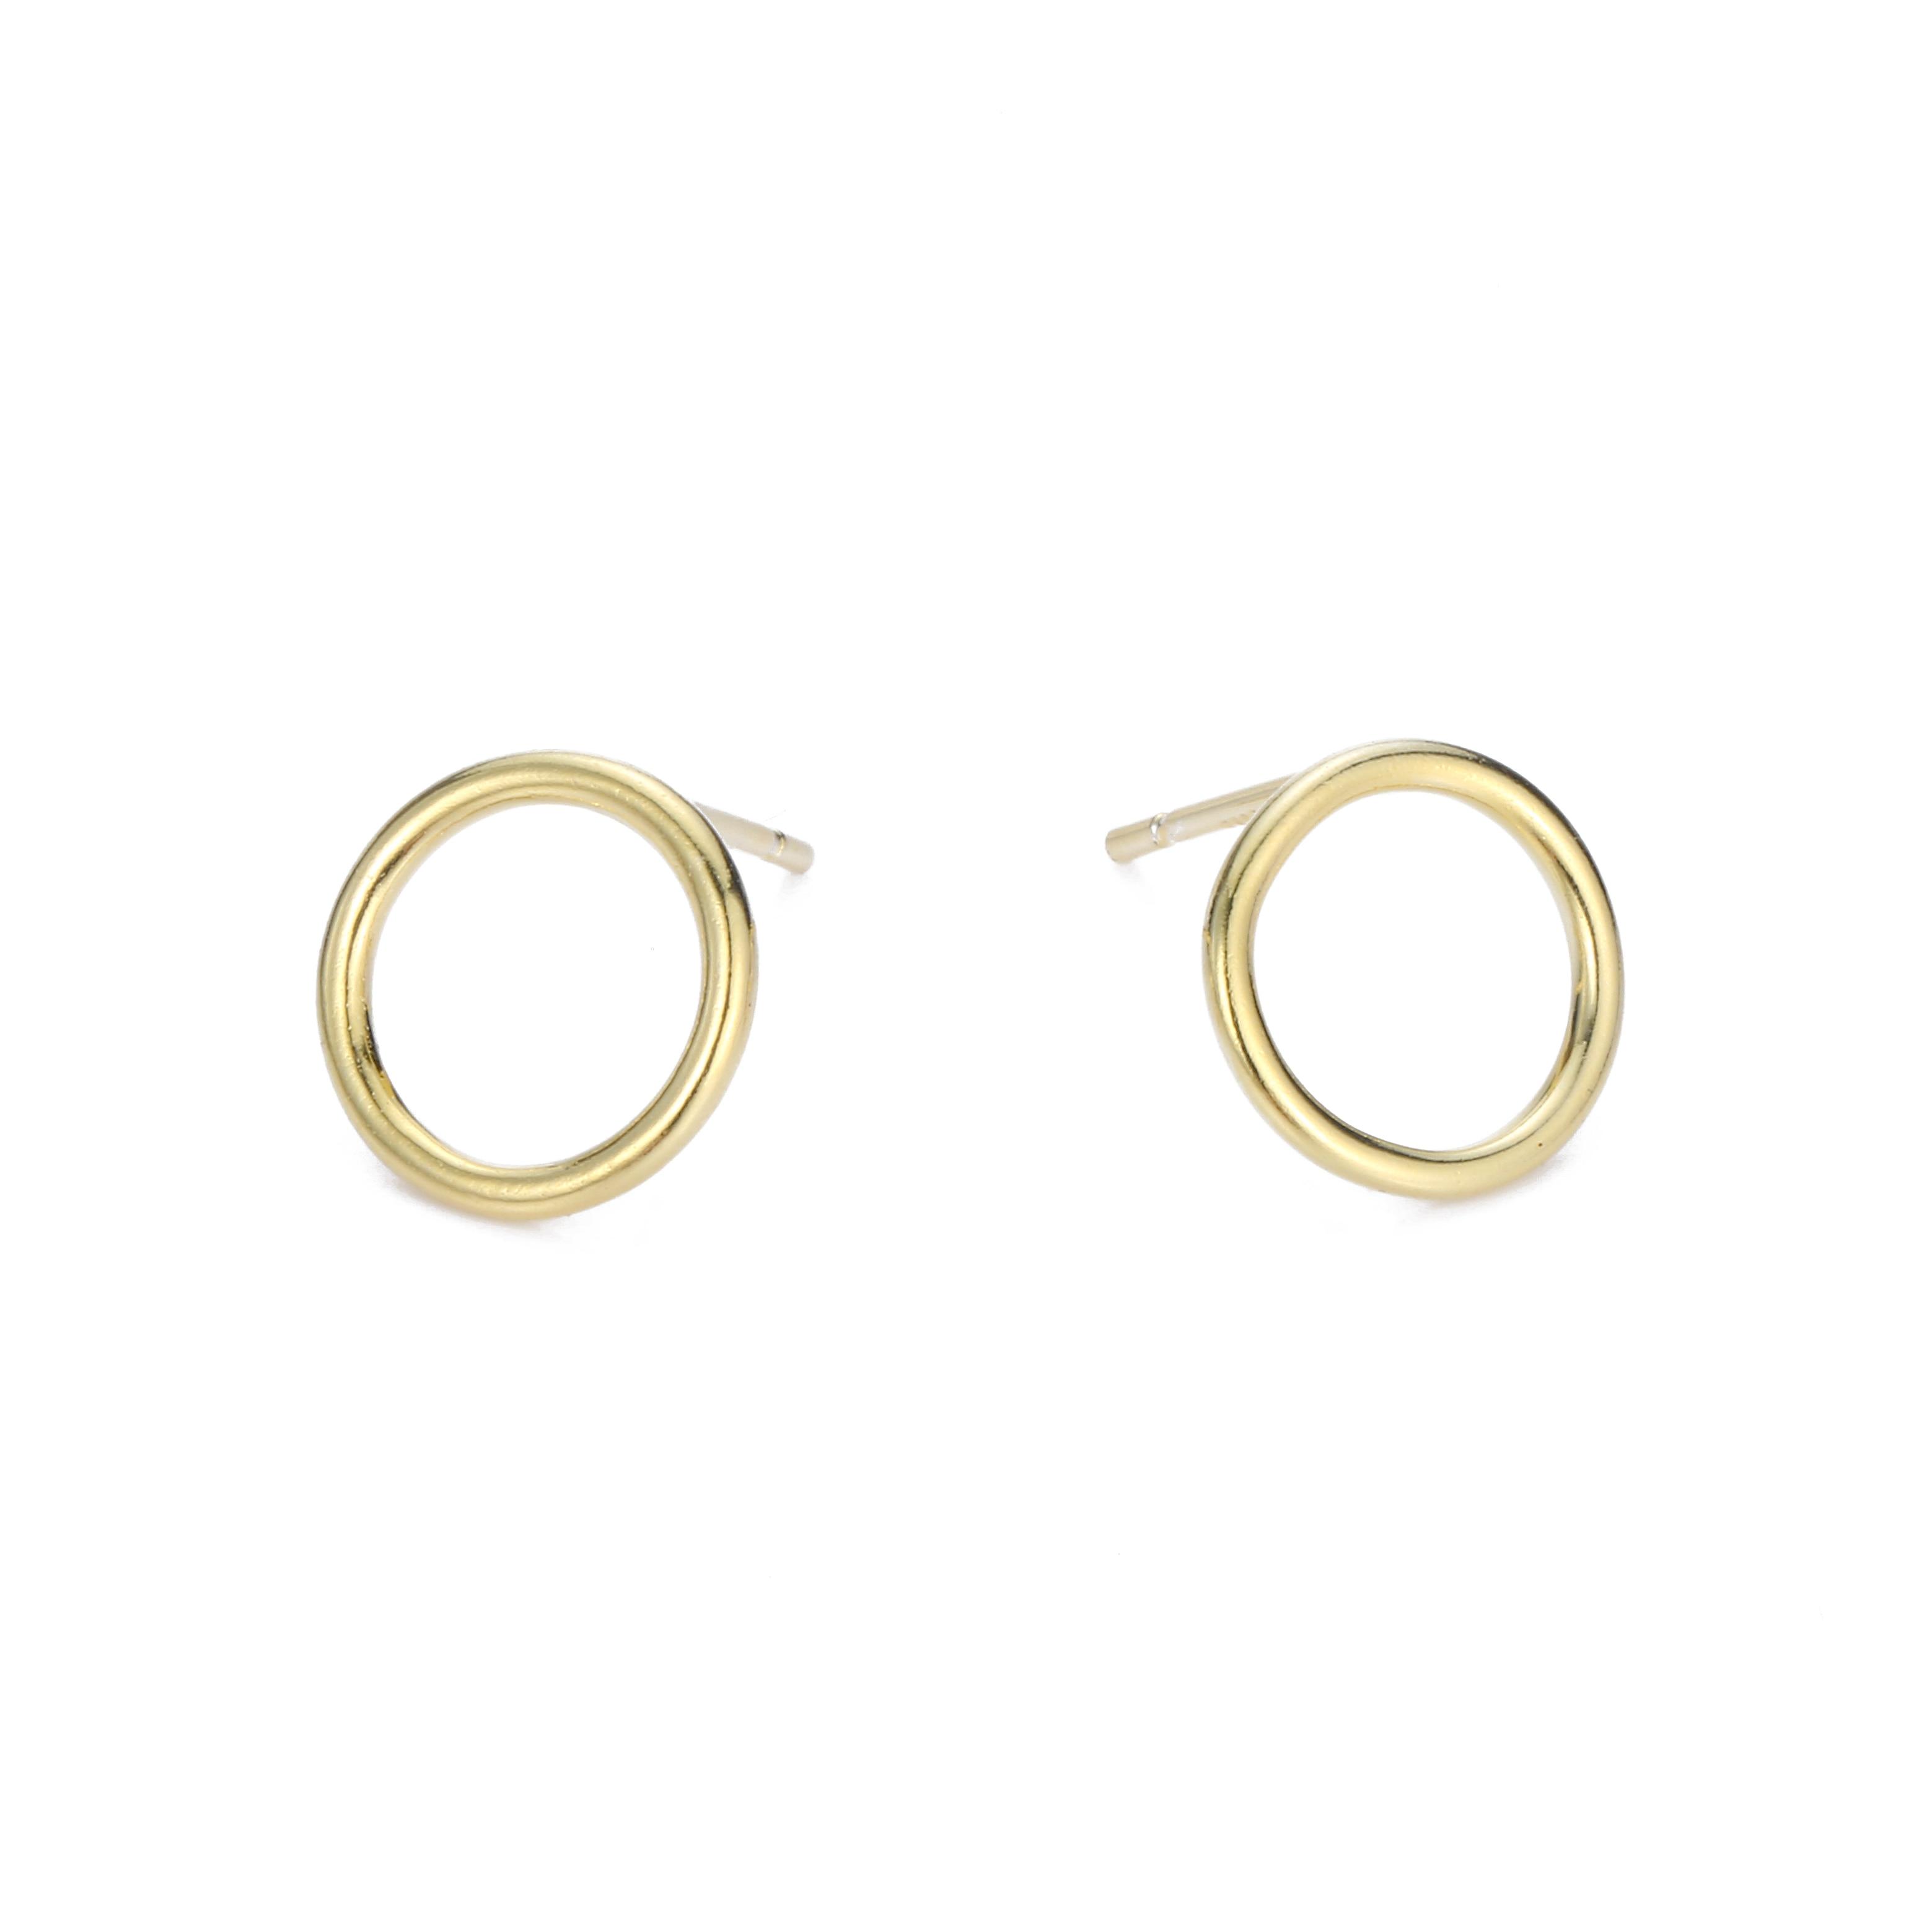 X2 Circle Grain Stud Earrings